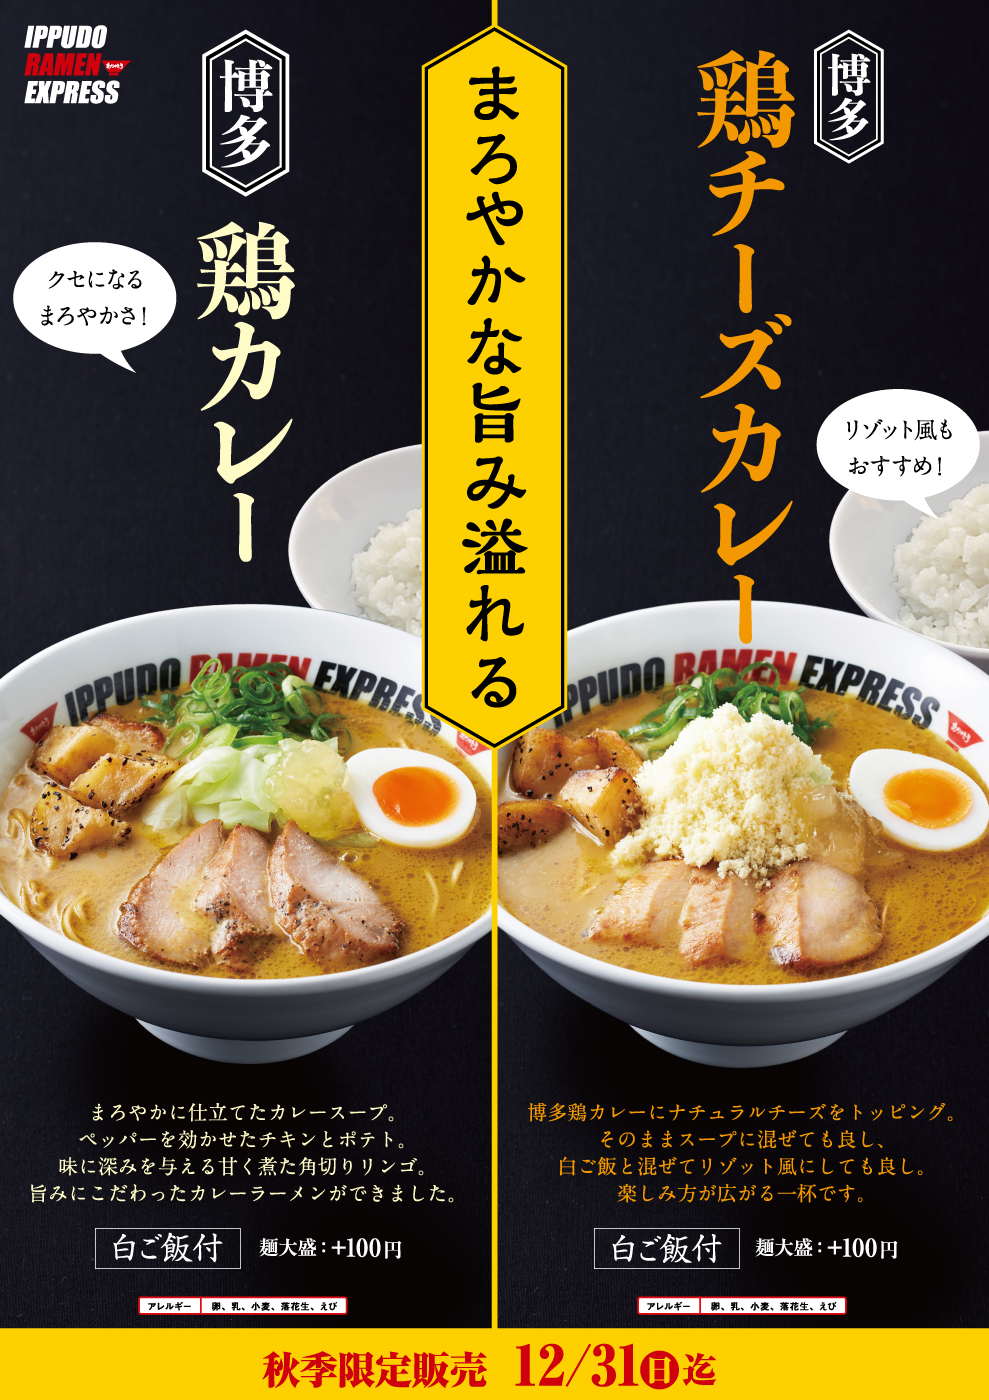 IRE_2017秋_博多鶏カレー_価格無しA1